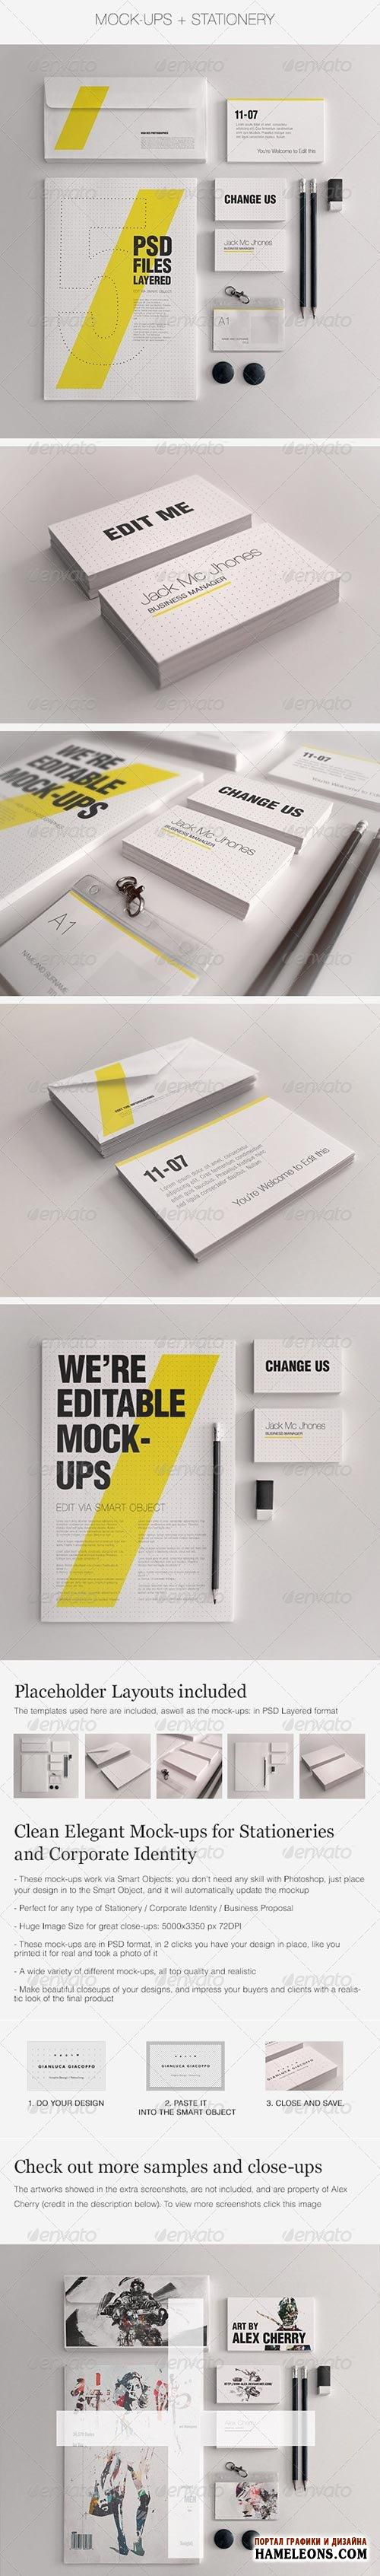 10-Great-Branding-Identity-Mock-Ups-9